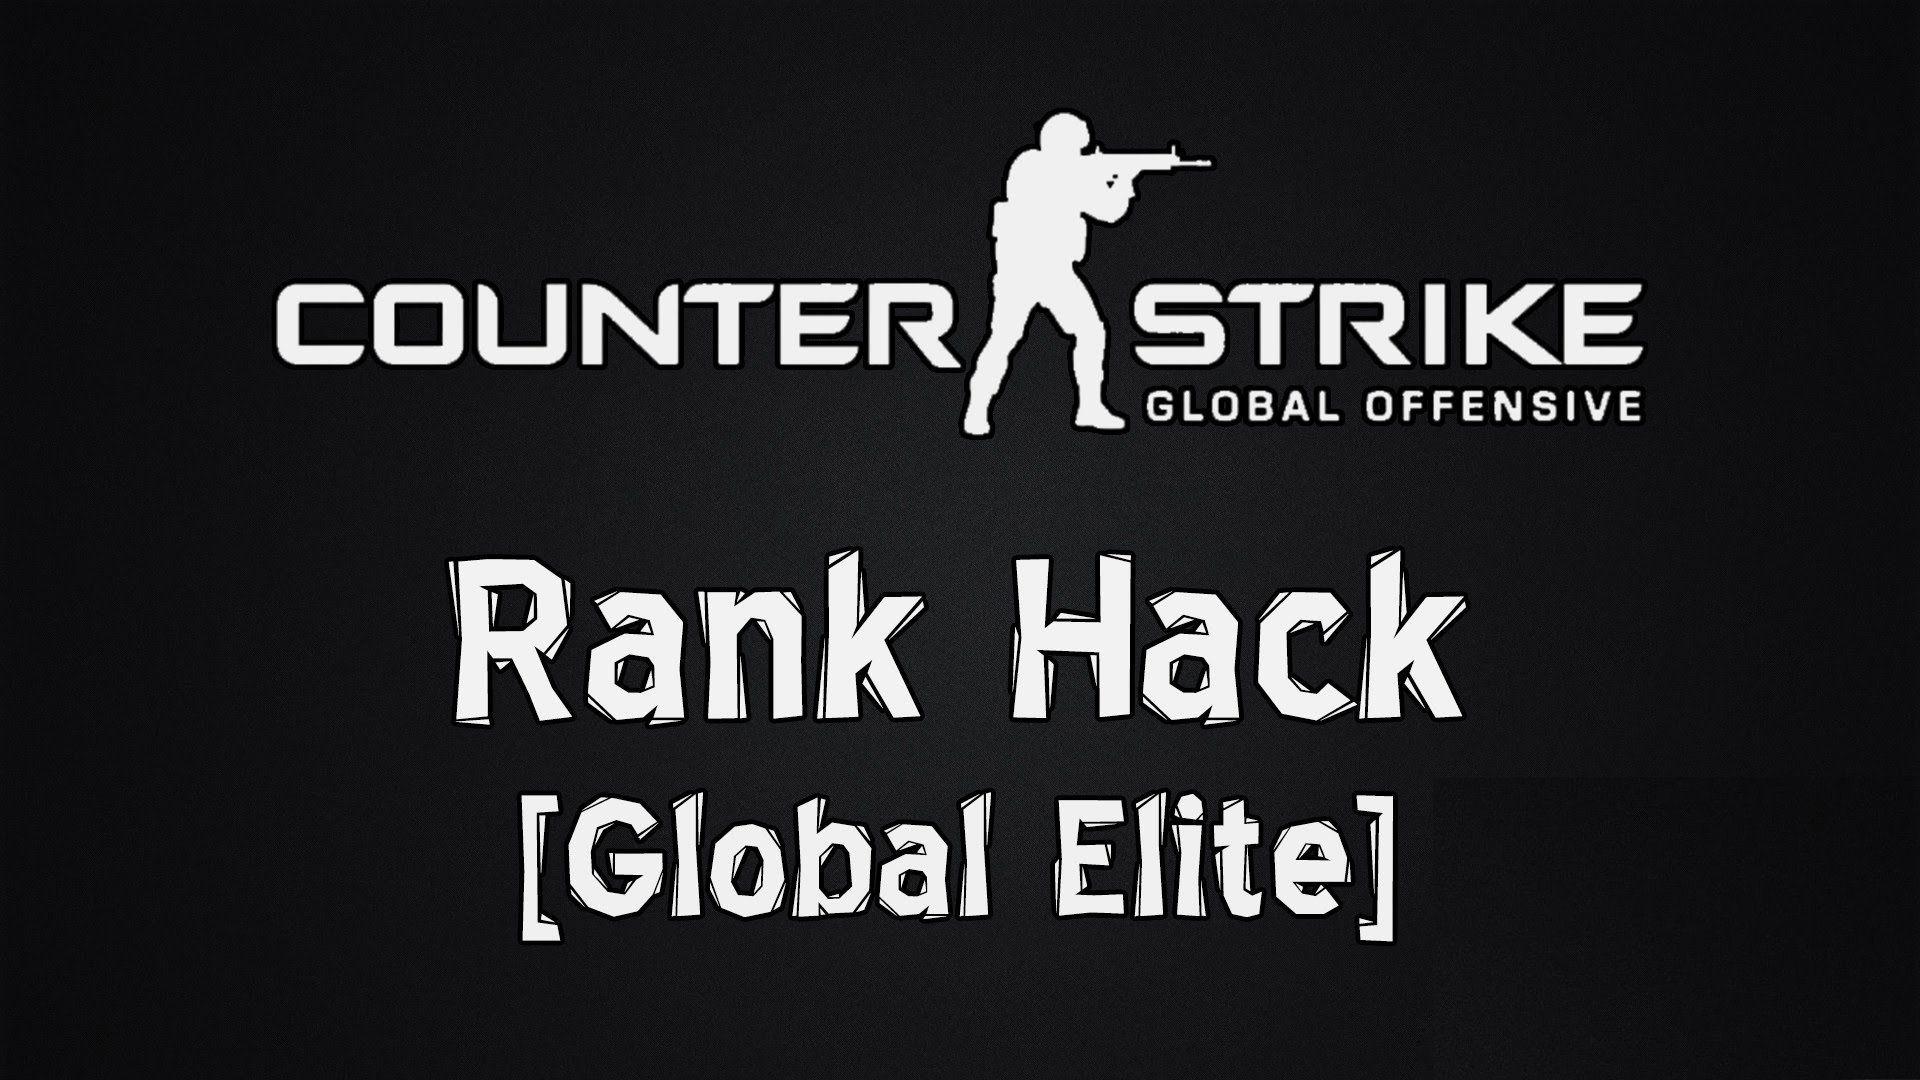 The CS GO Rank Hack Features: Instant CSGO Rank Hack - Get